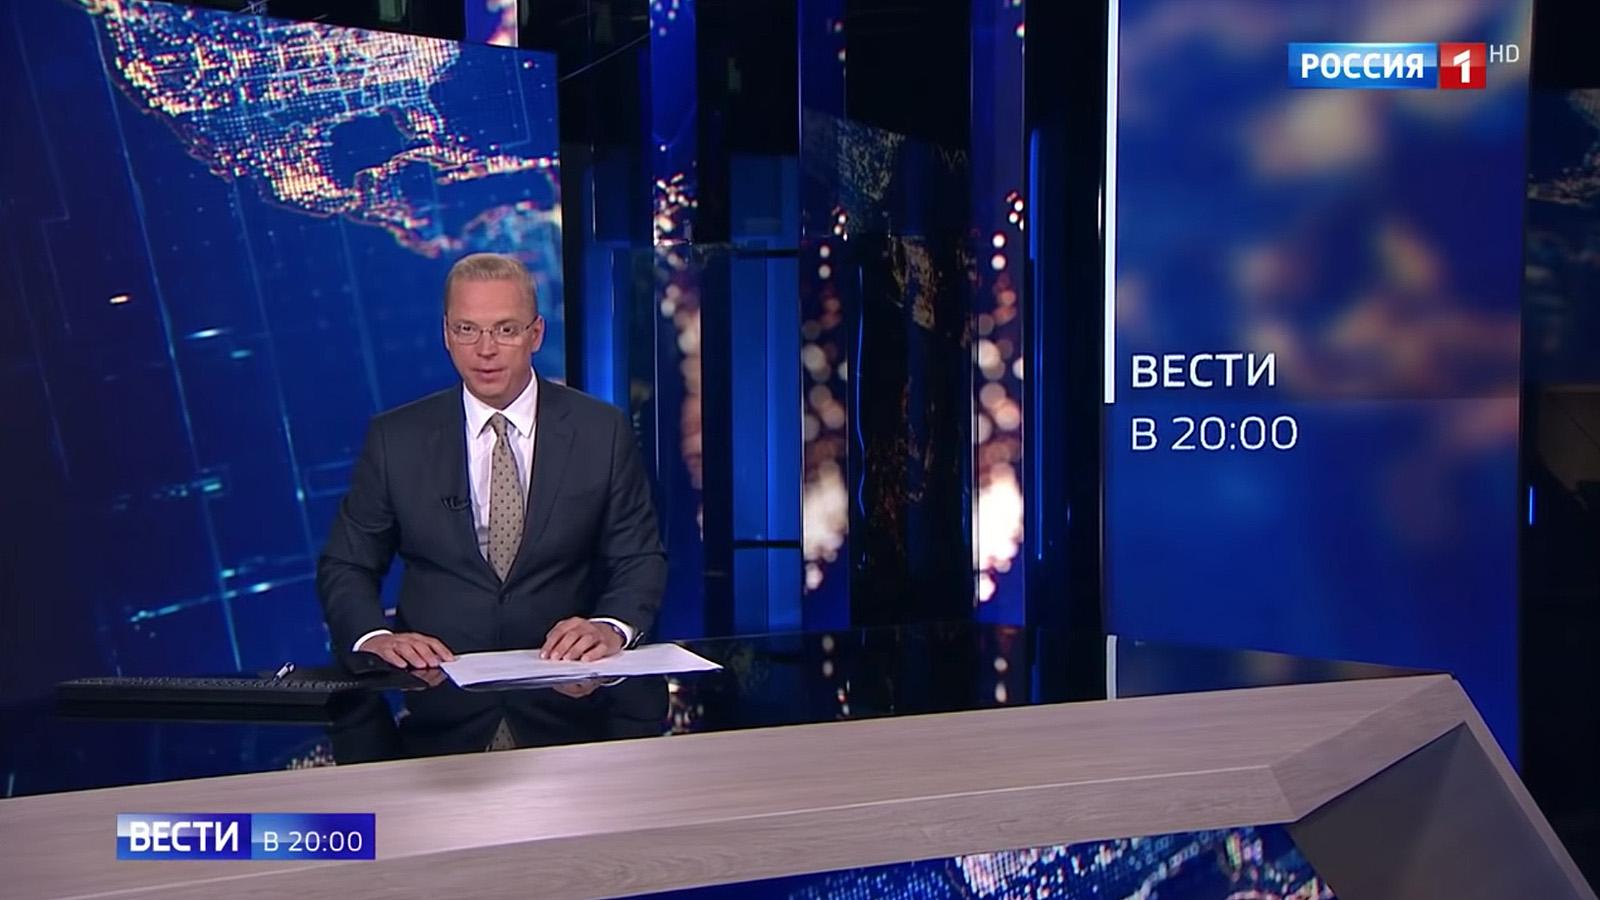 NCS_Russia-1-Vesti-Studio_0005